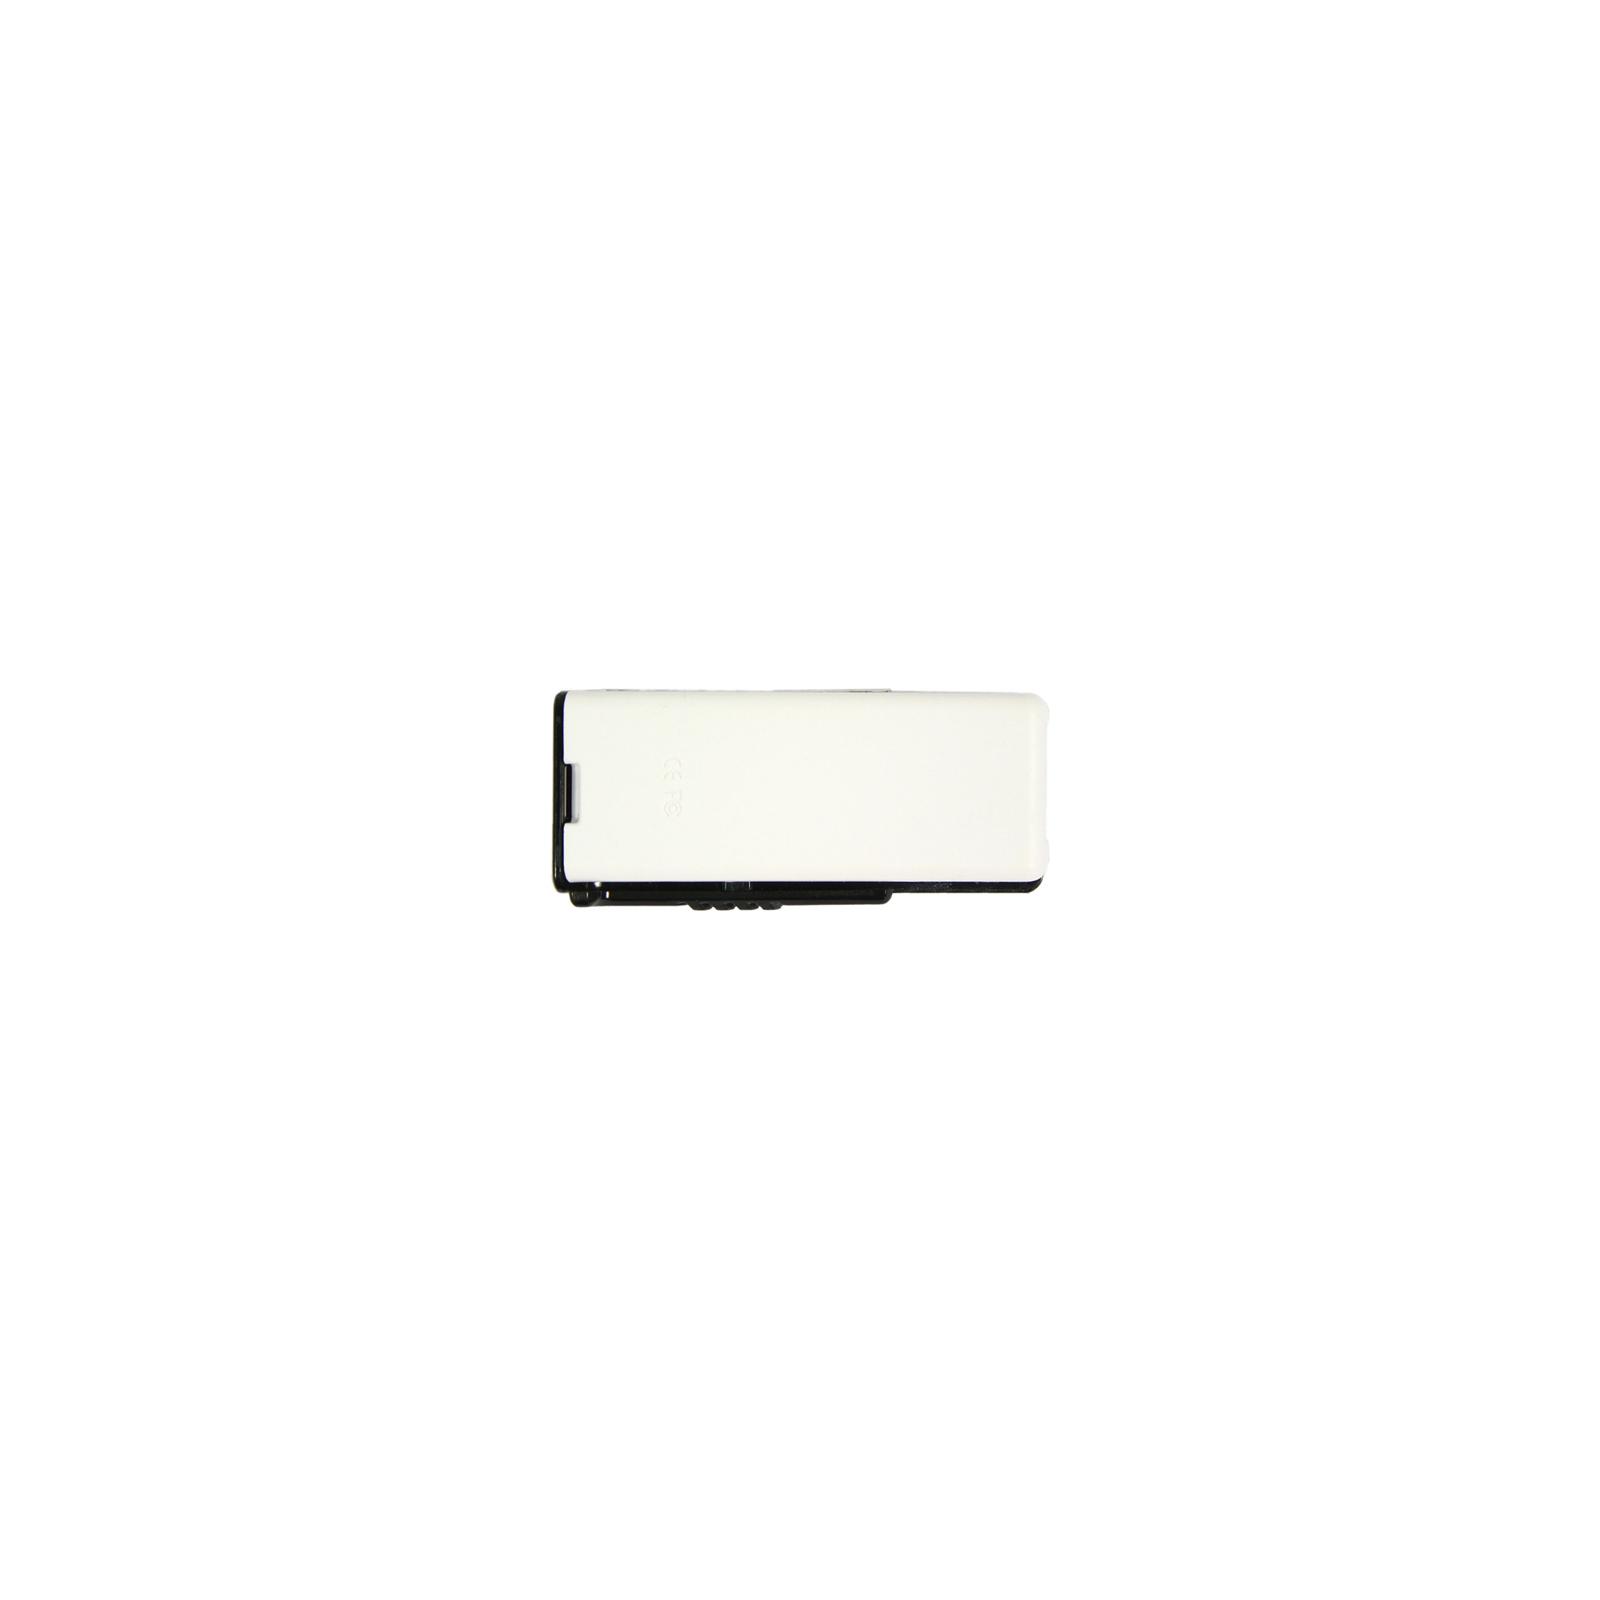 USB флеш накопитель 128GB AH350 Black RP USB3.0 Apacer (AP128GAH350B-1) изображение 2